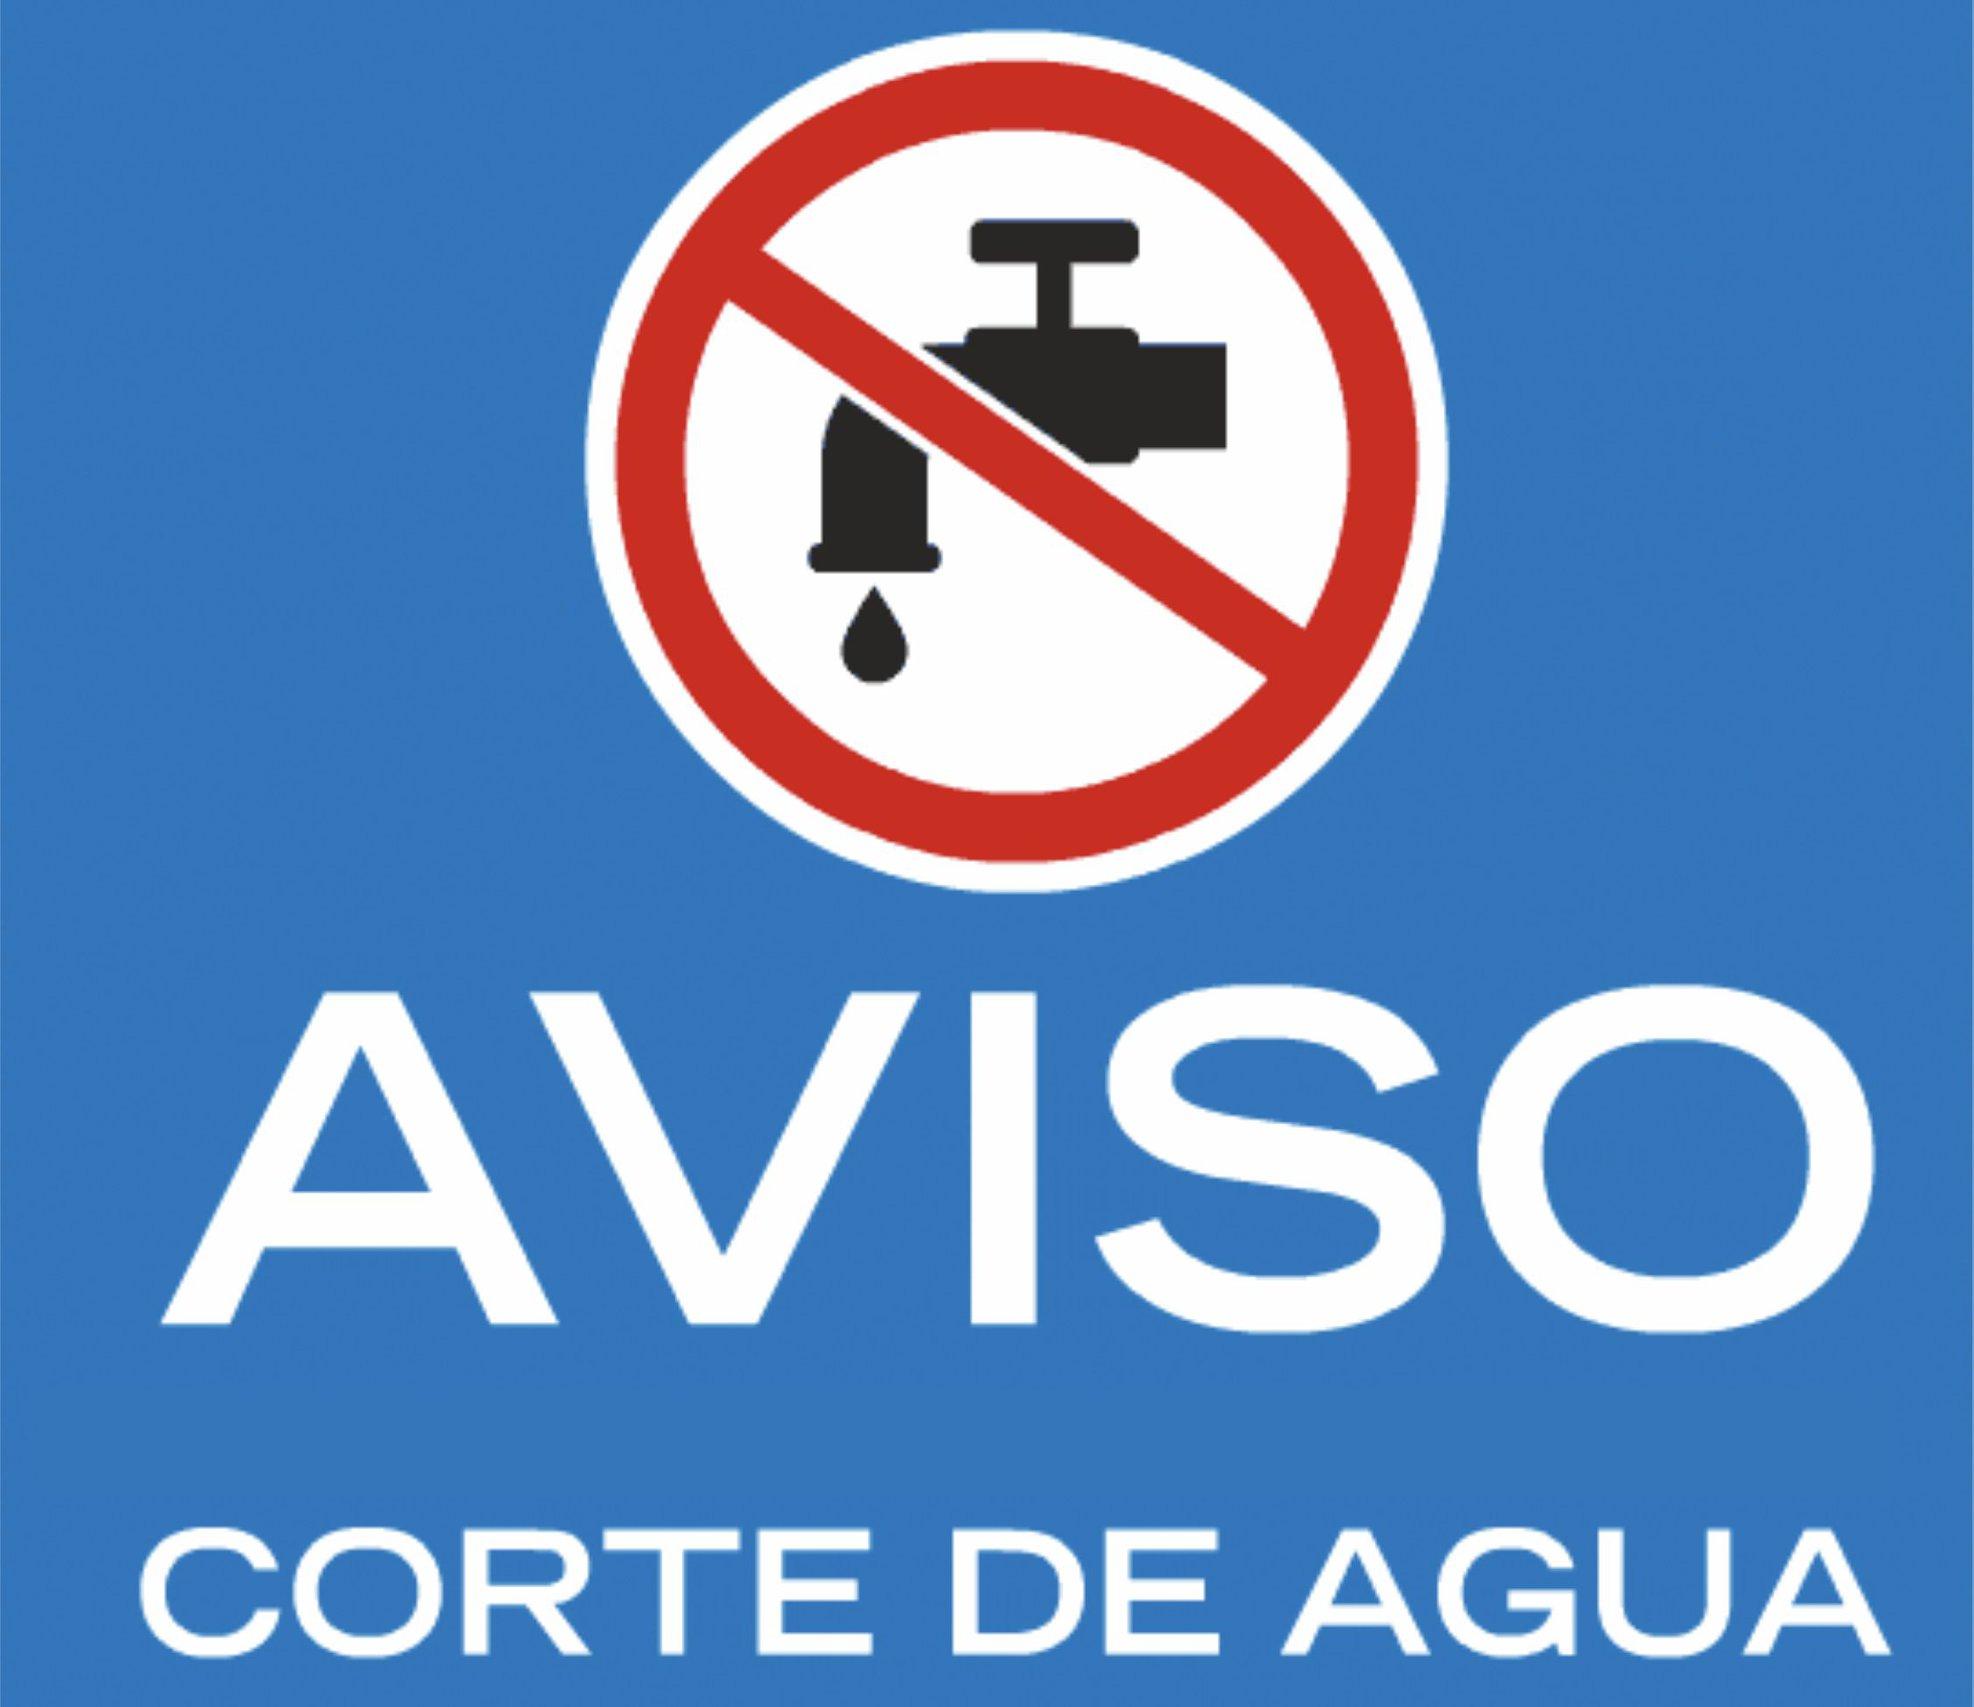 logo aviso corte de agua